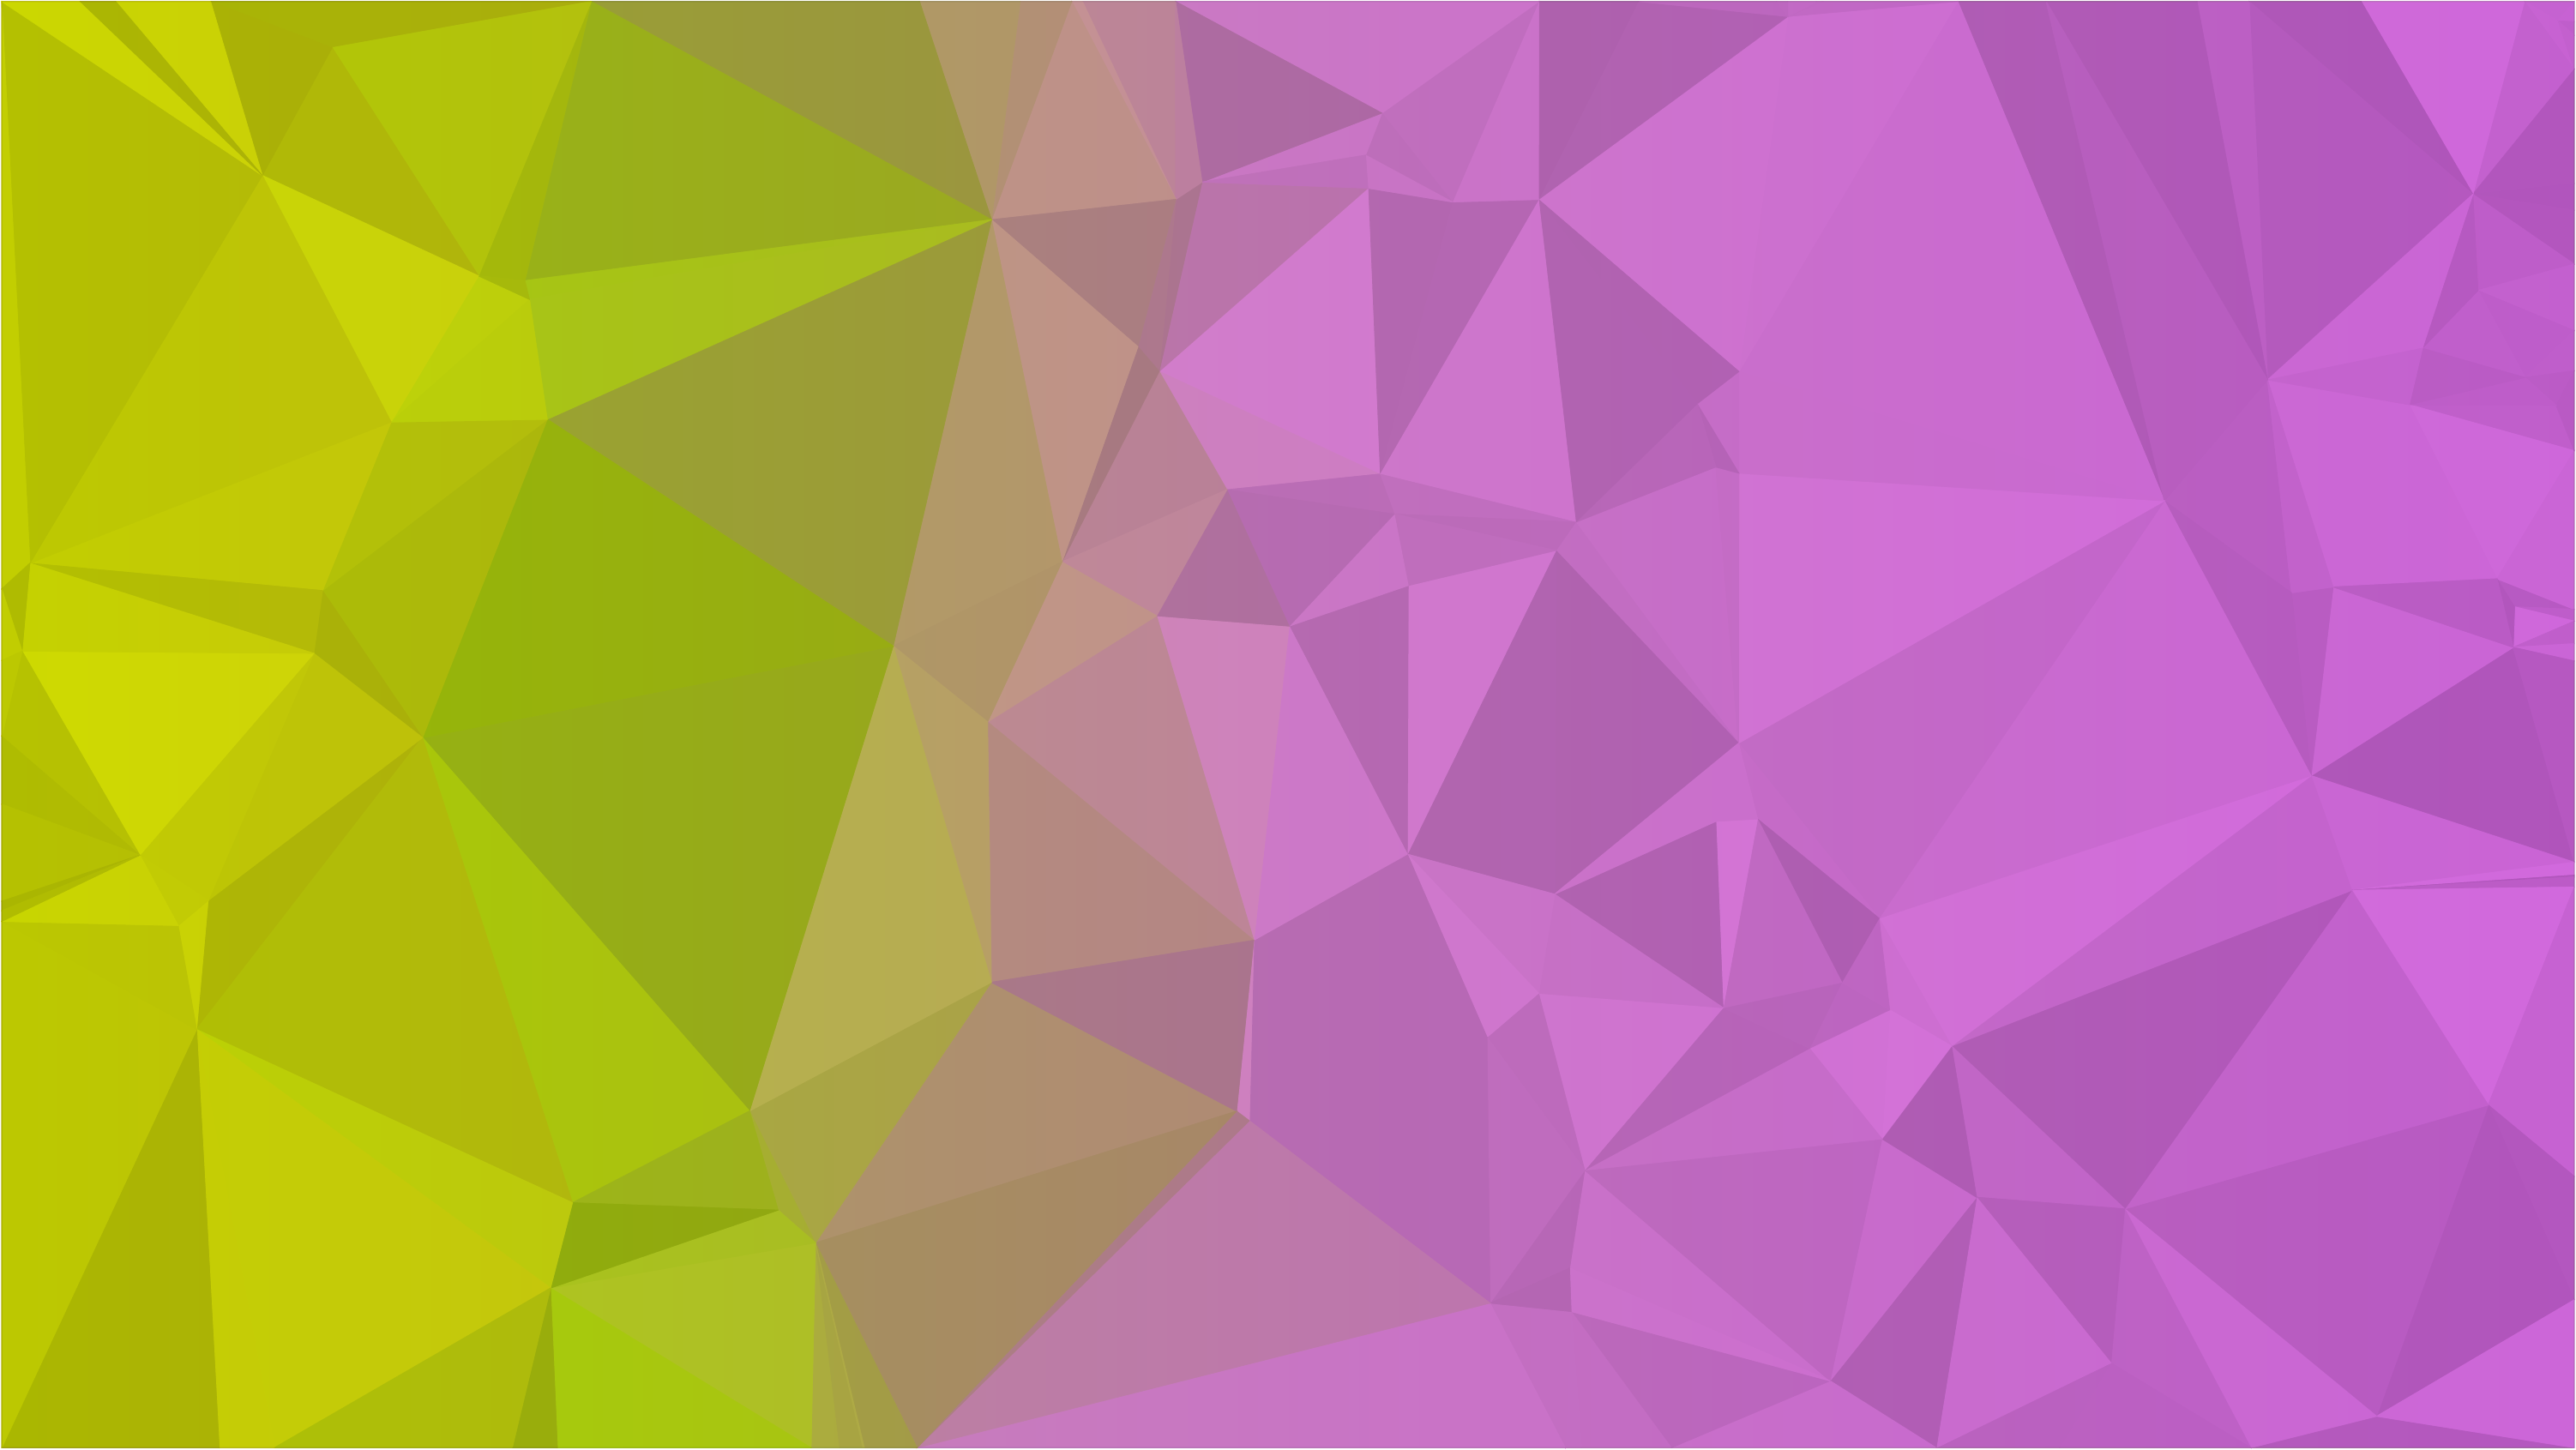 AdobeStock_220874012 (1) [Converti]